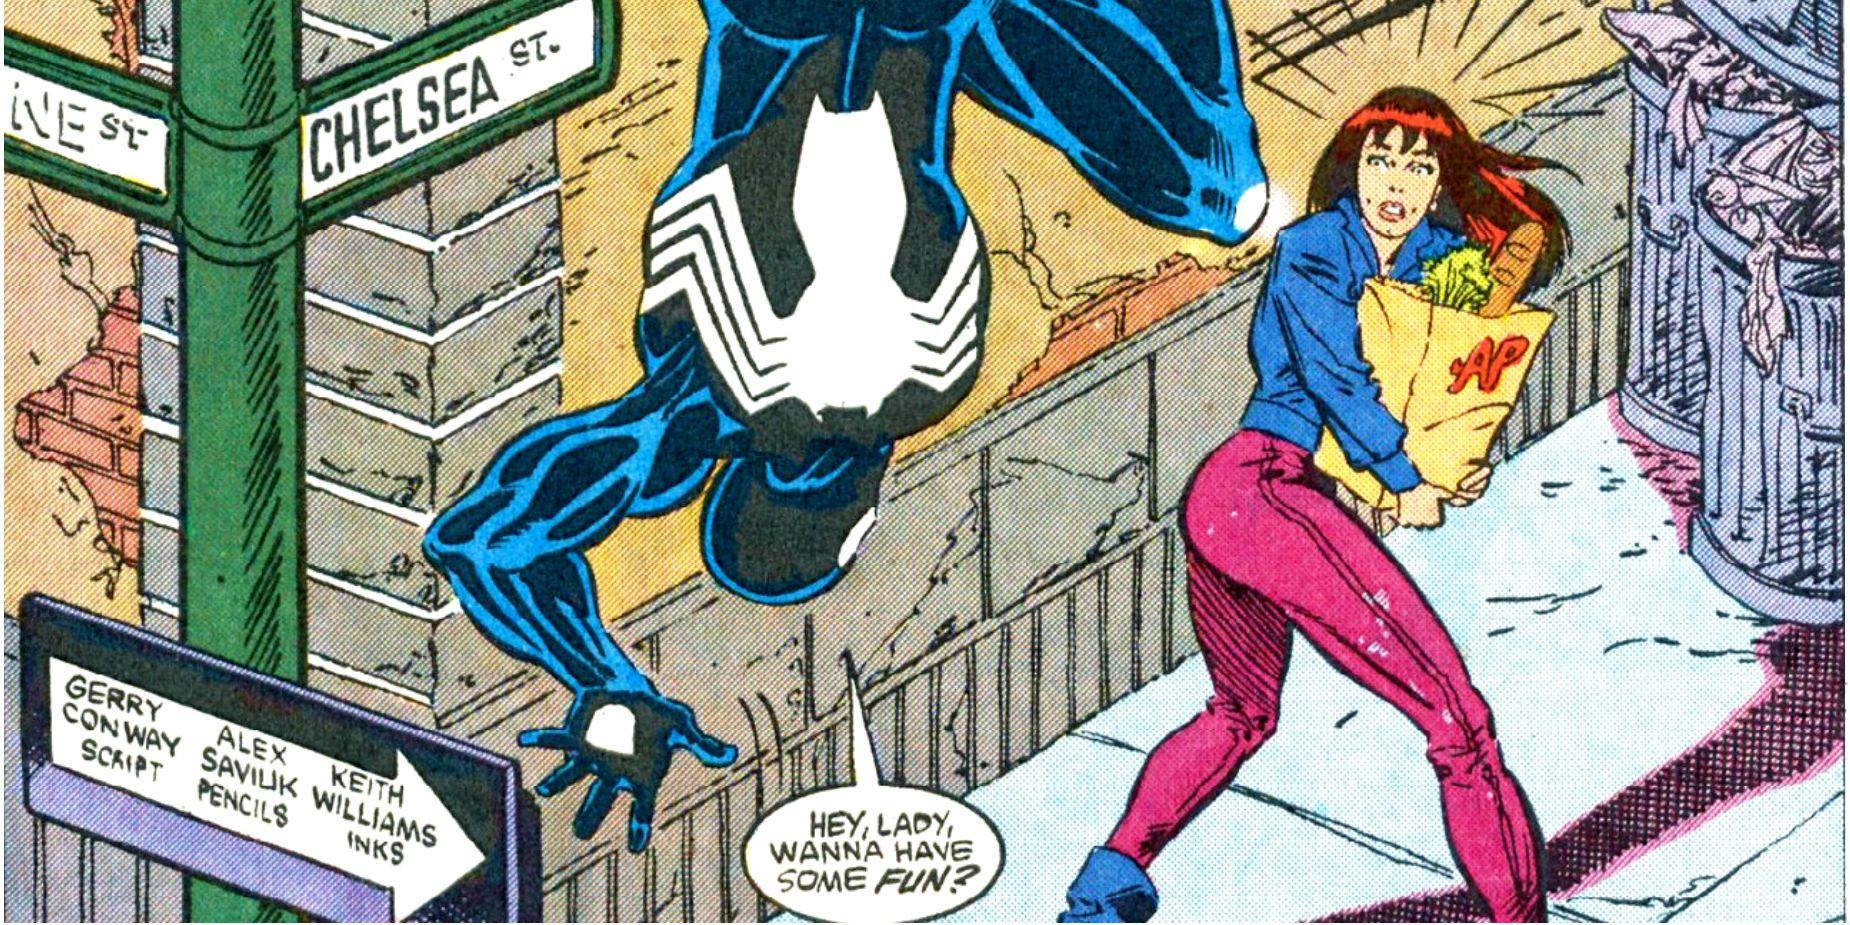 SENSATIONAL: Spider-Man's Cheekiest Bedroom Antics | CBR